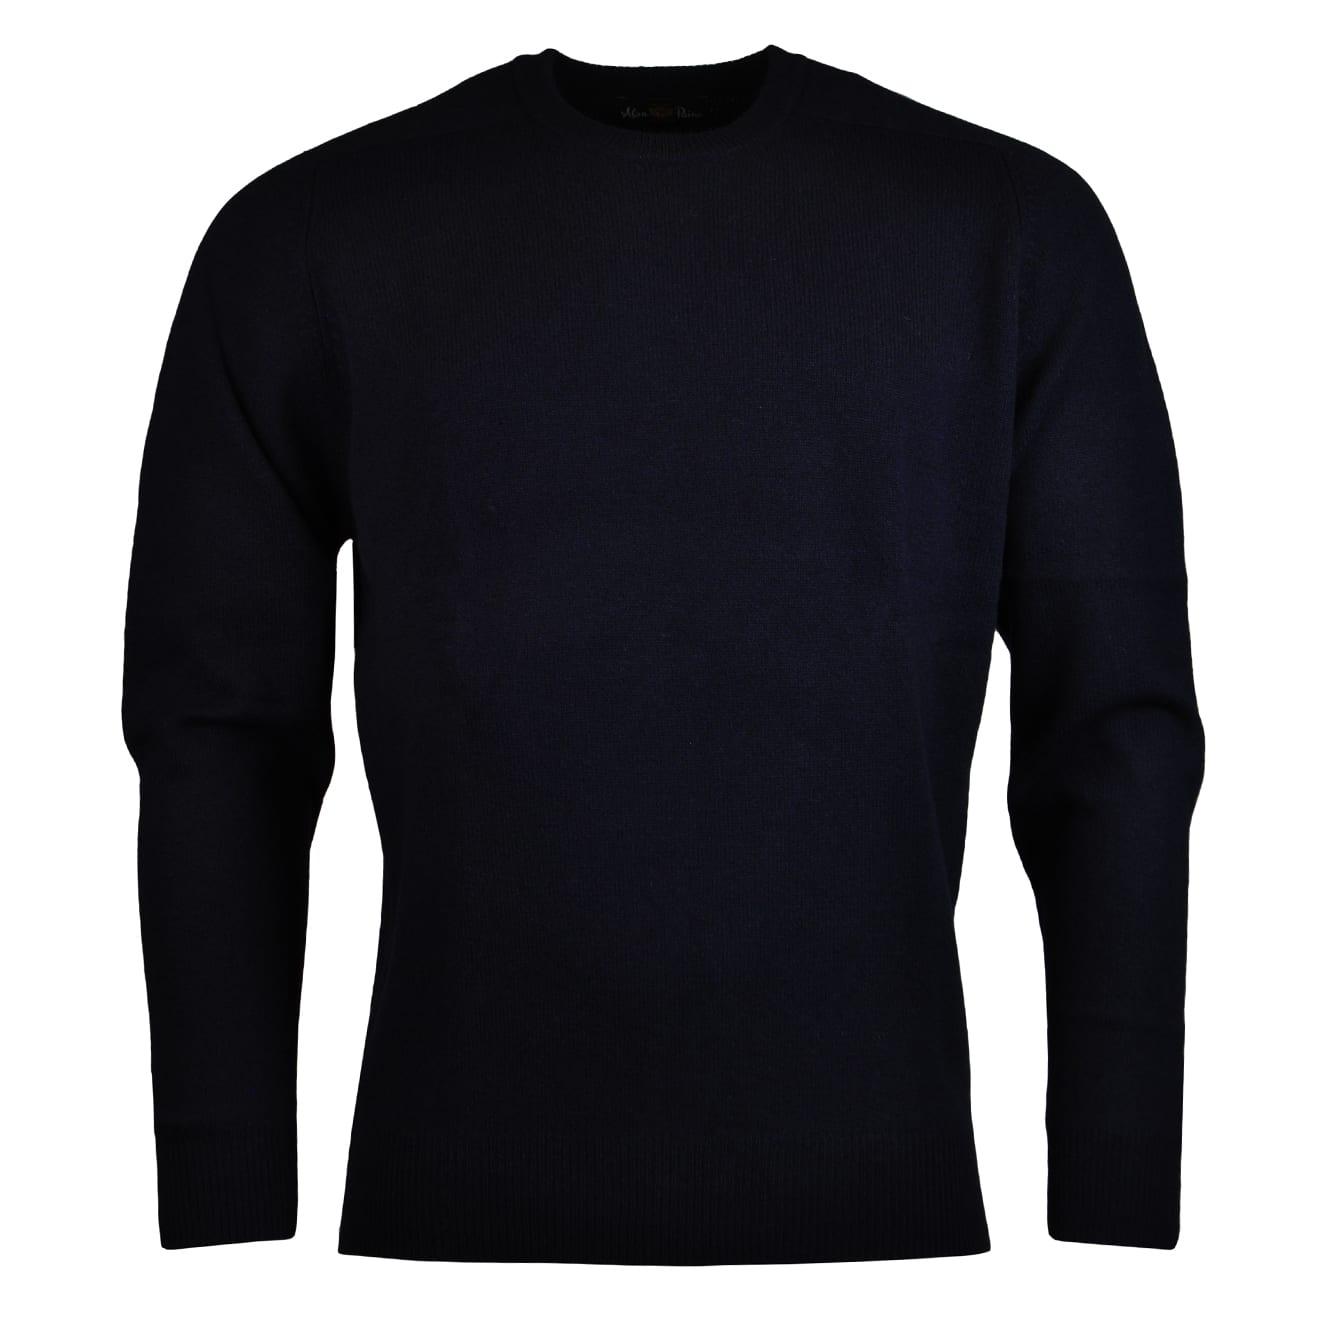 Alan Paine burford crew neck lambswool knit dark navy 2